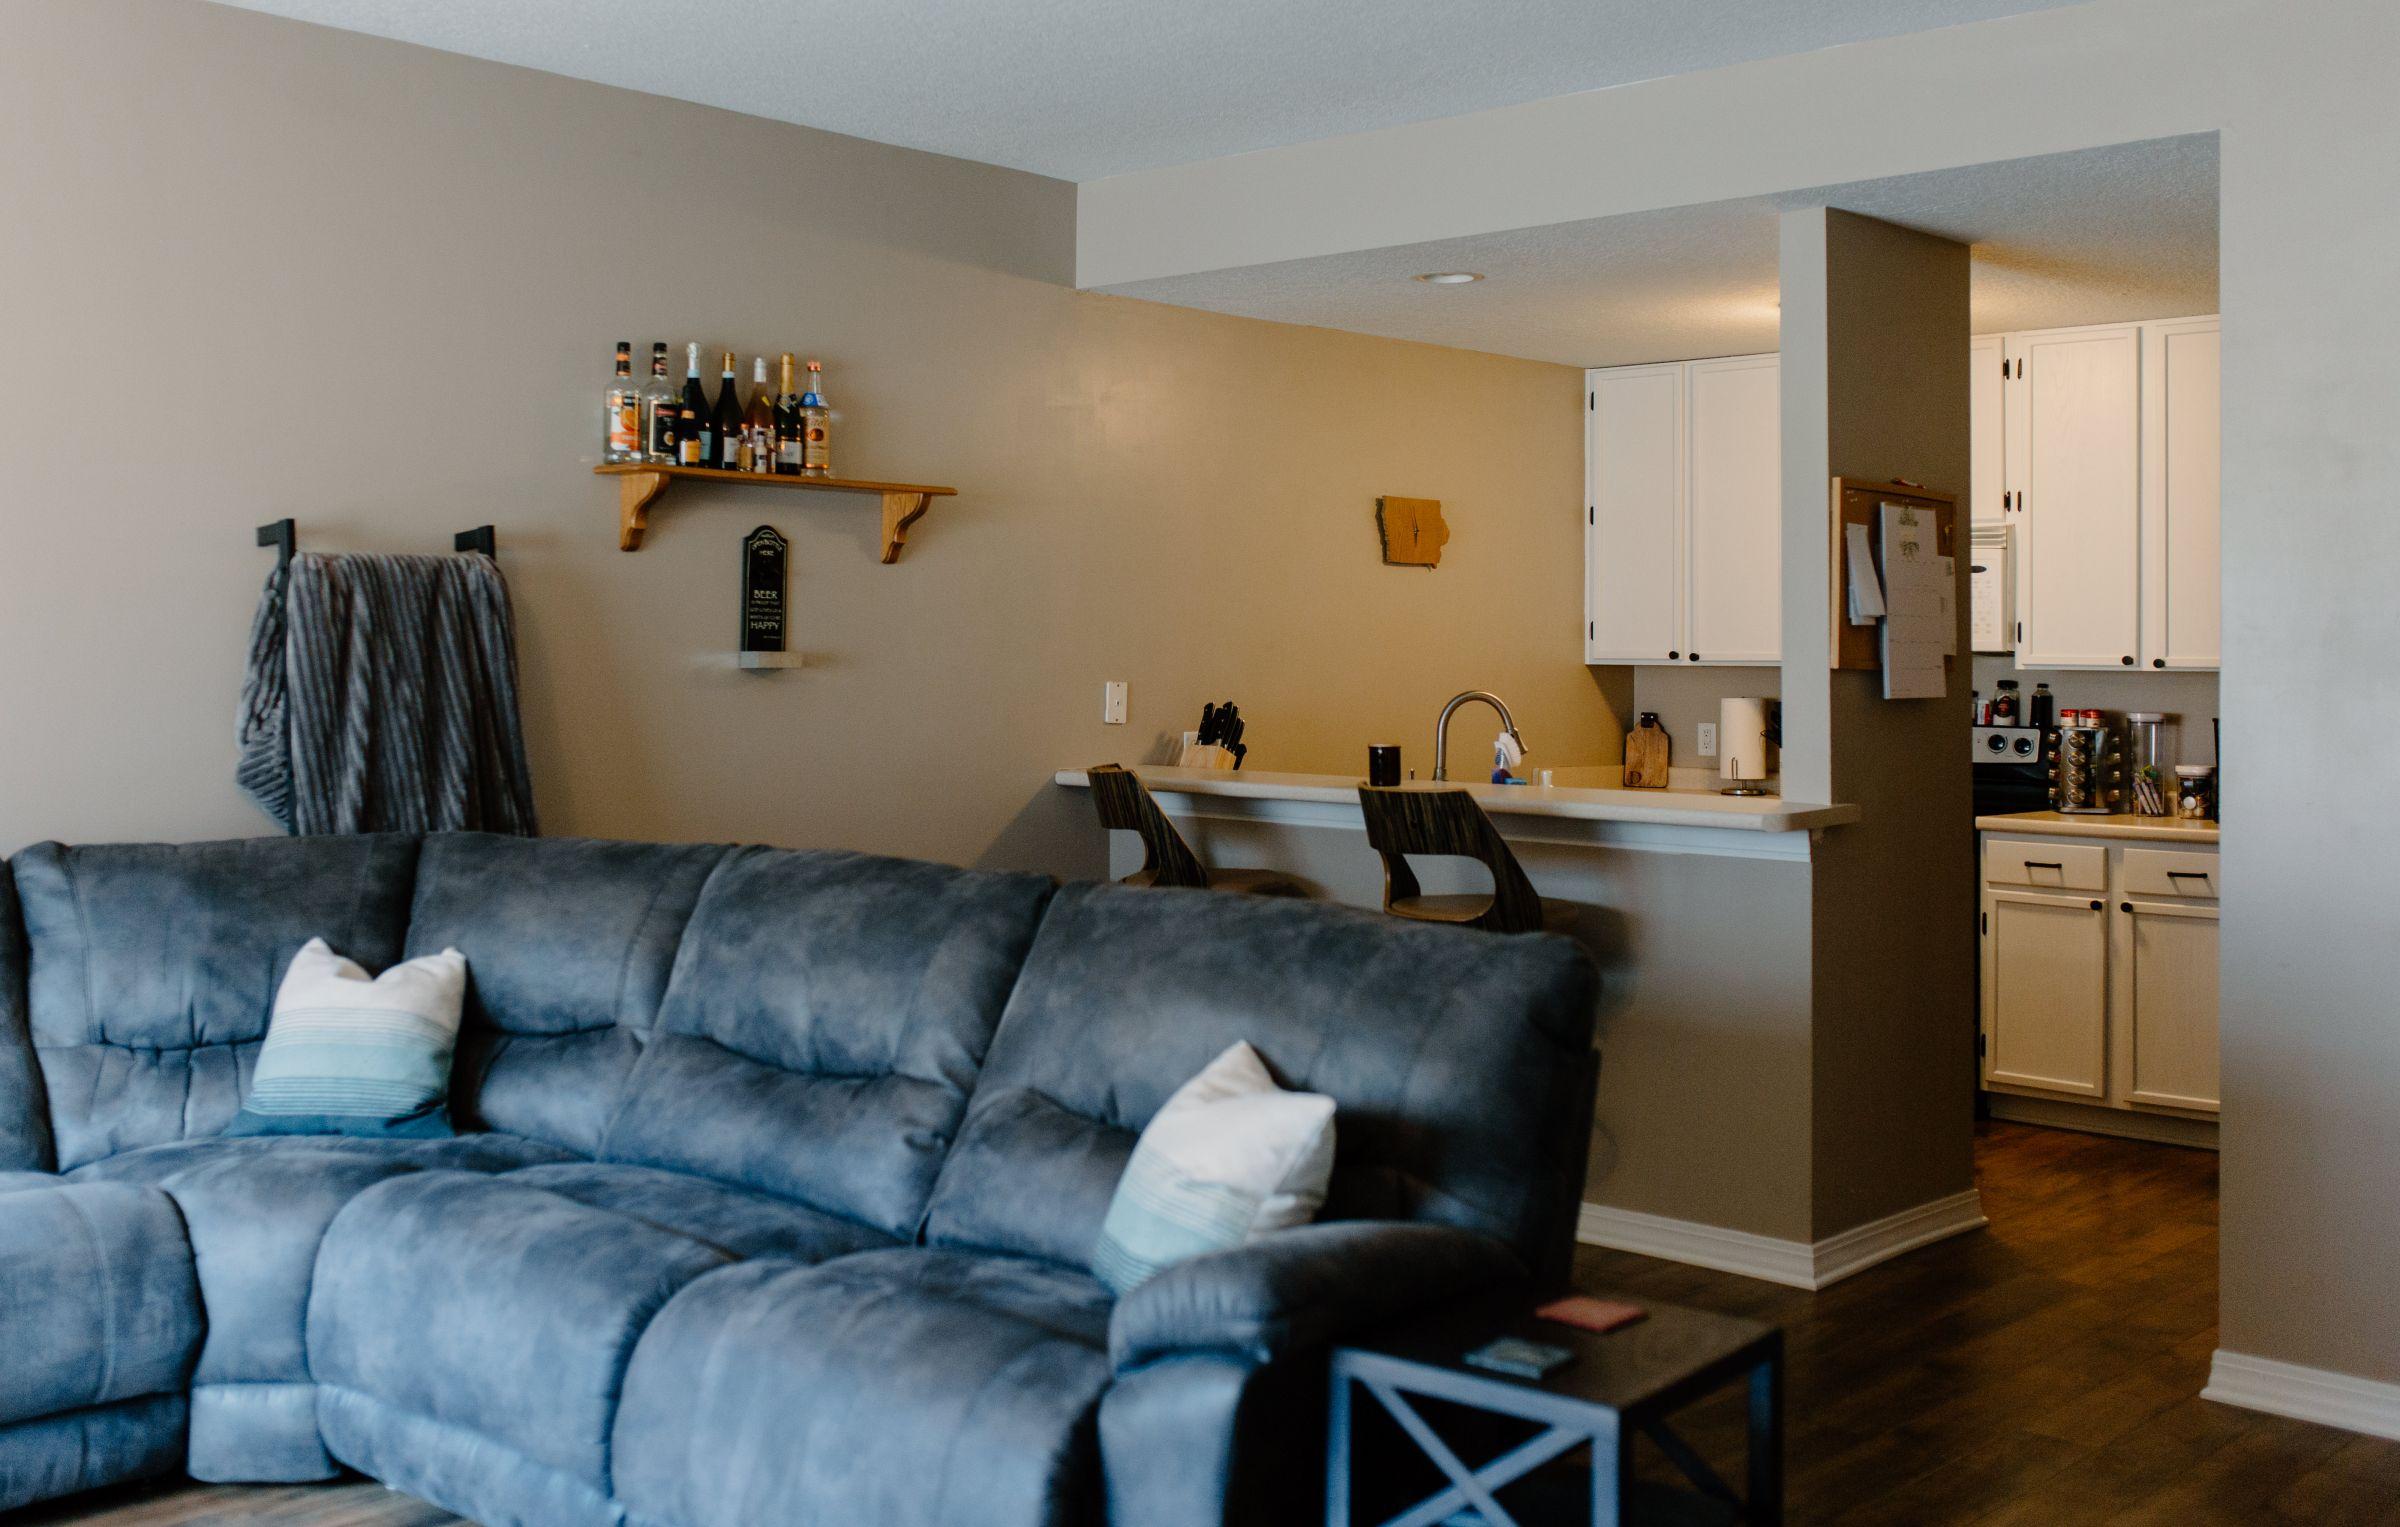 residential-polk-county-iowa-0-acres-listing-number-15418-5-2021-03-22-162132.jpg